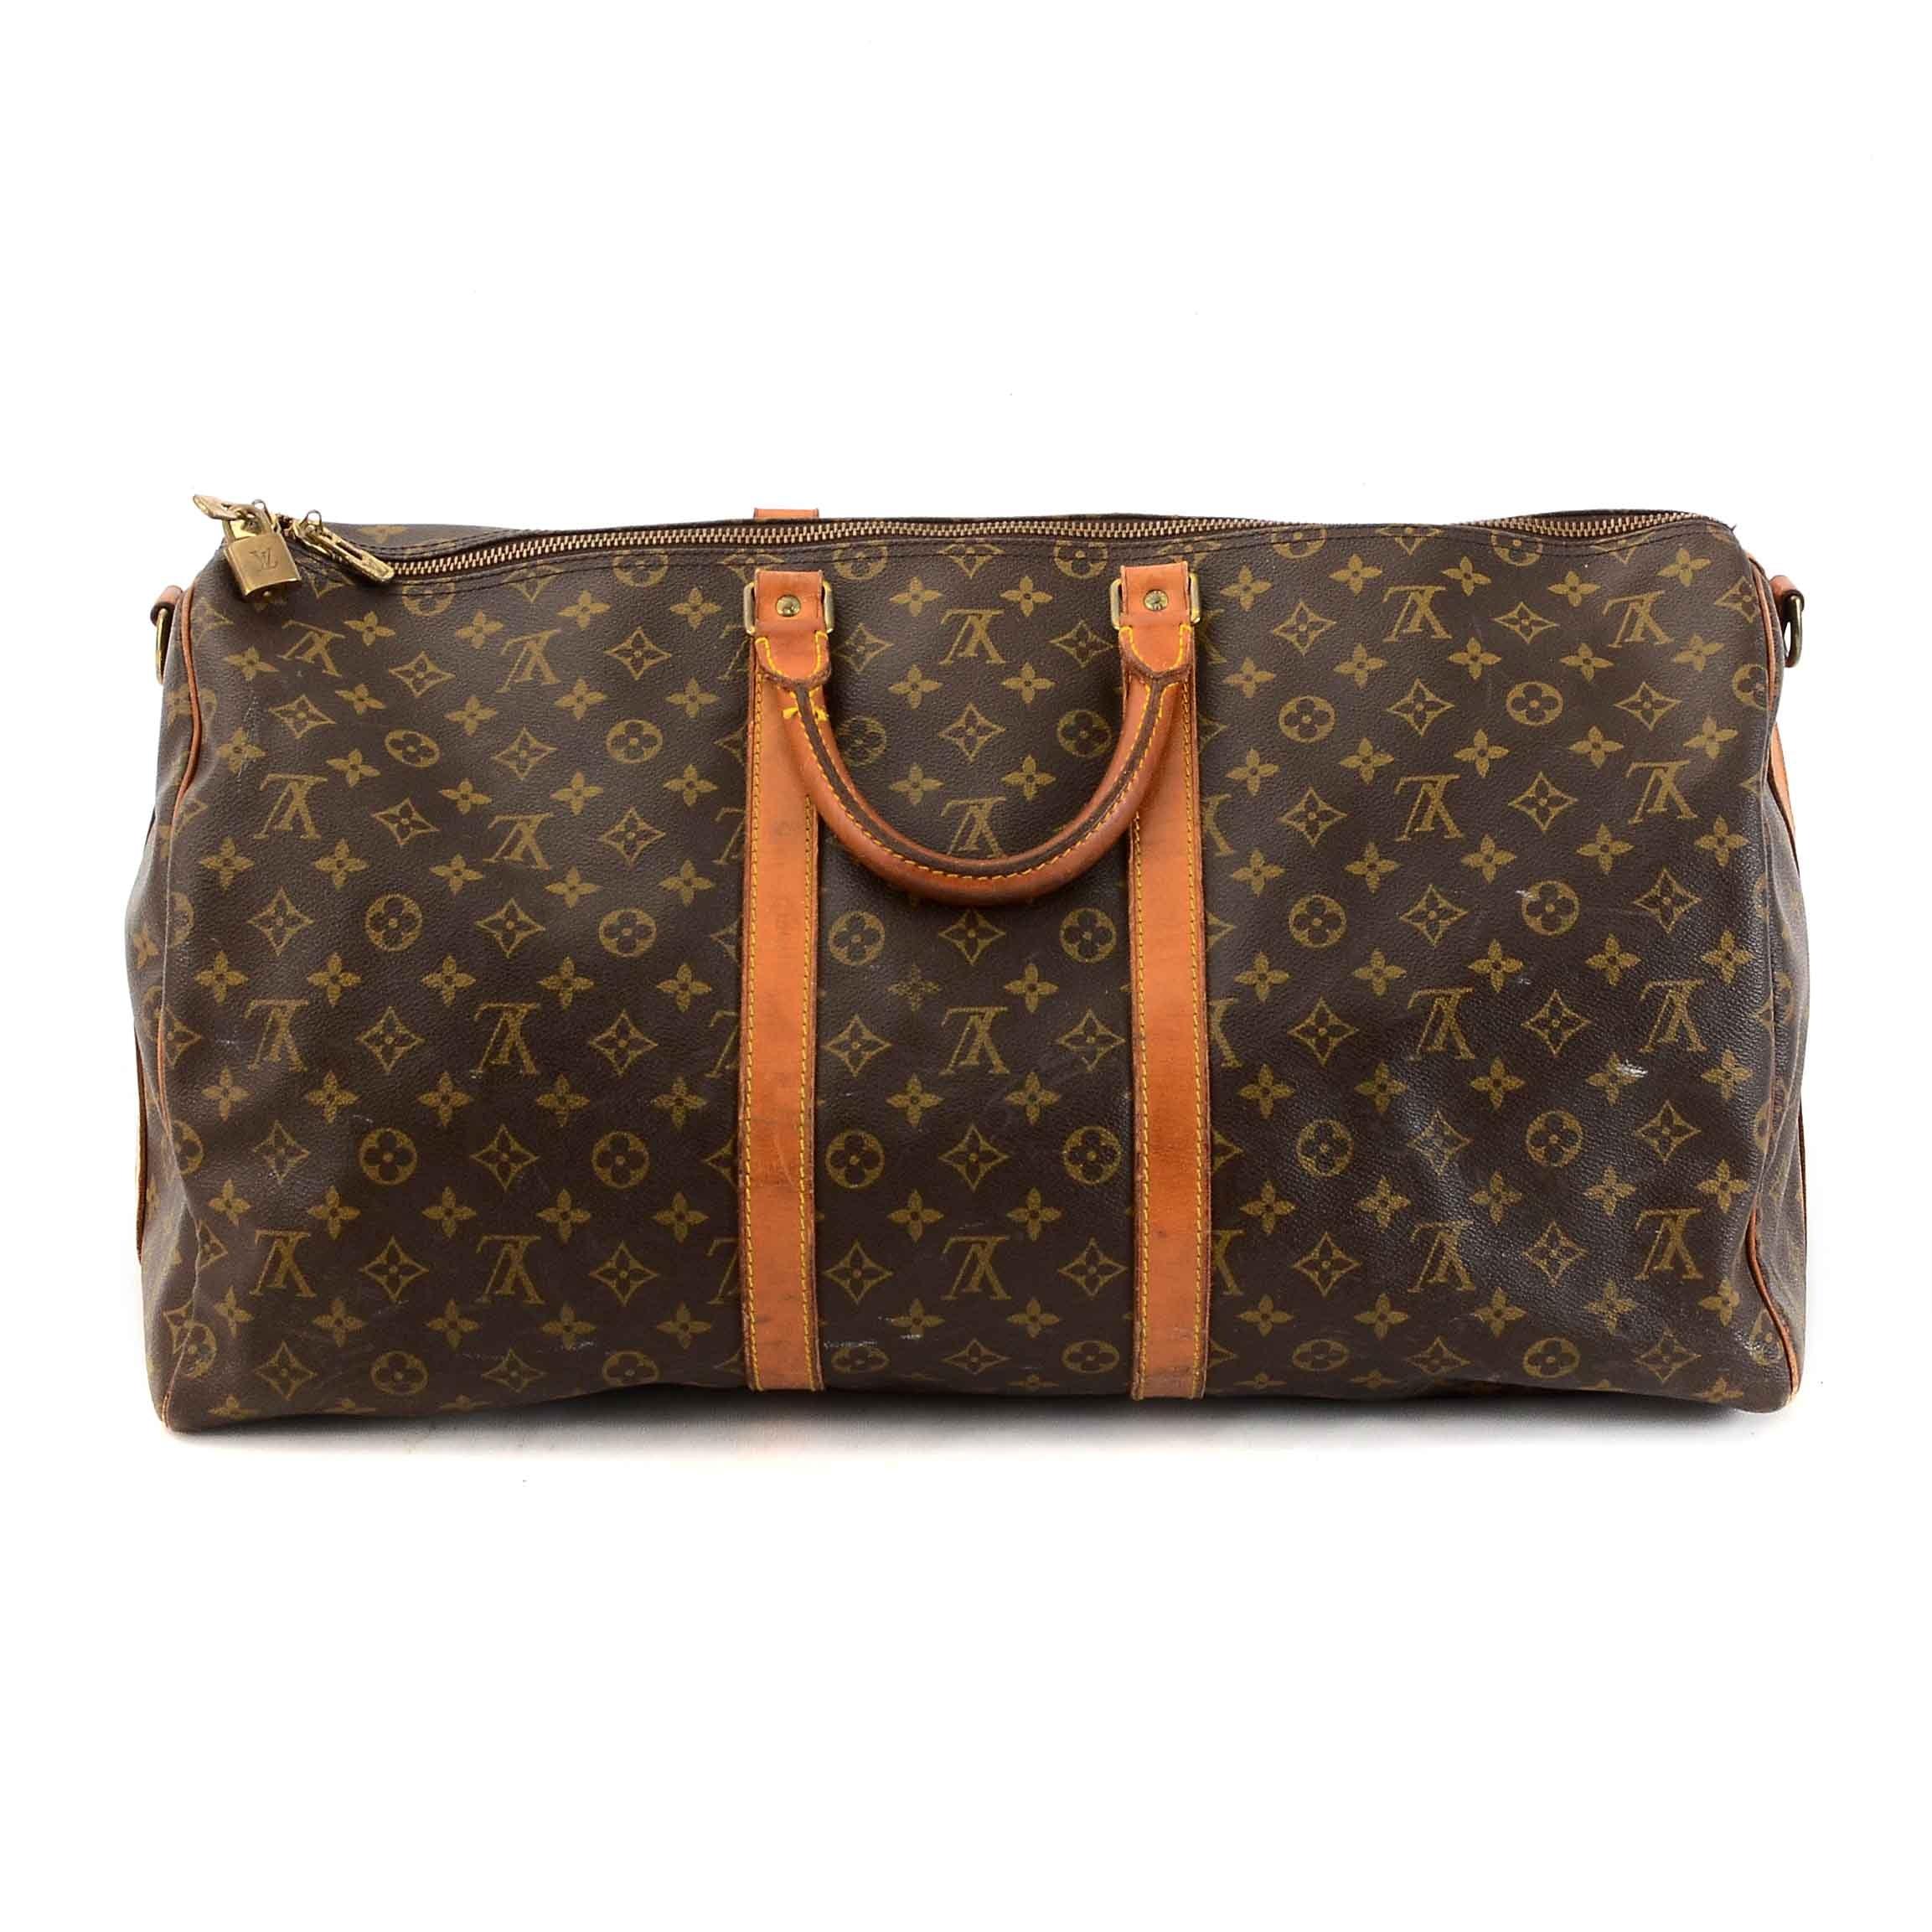 Vintage Louis Vuitton Signature Monogram Canvas Keepall Duffle Bag